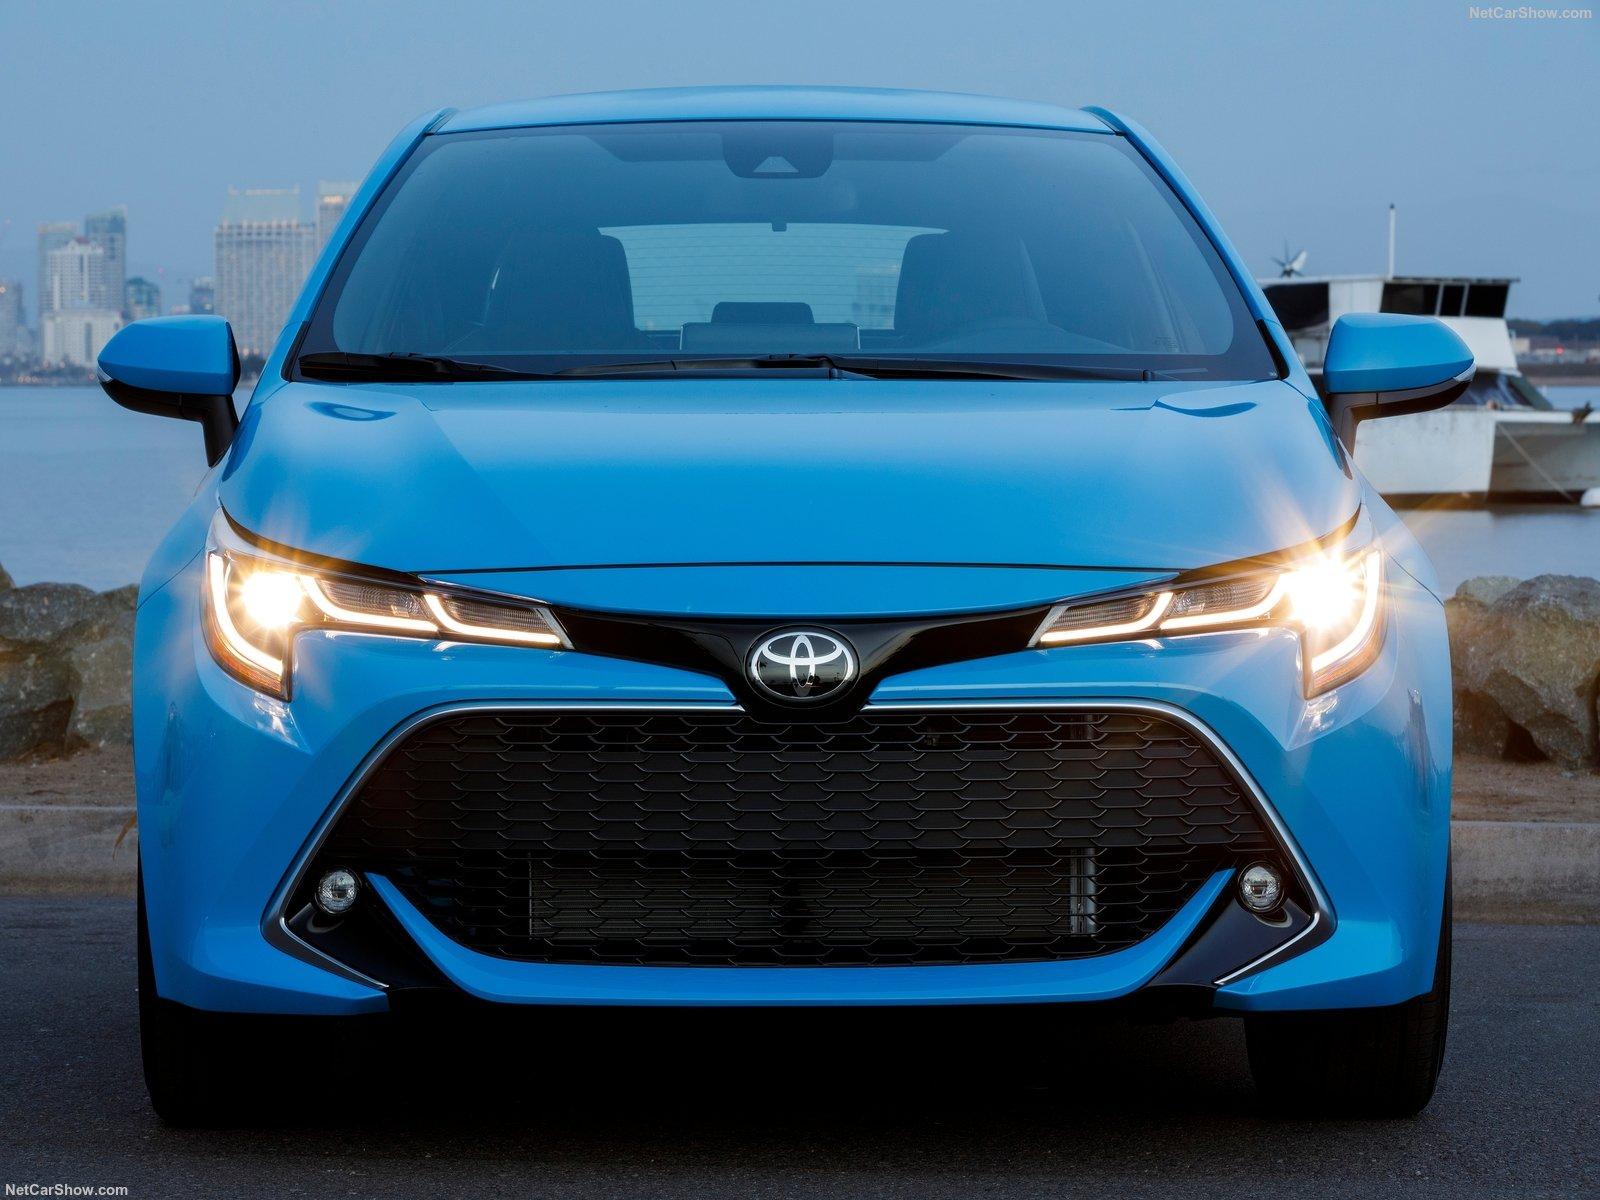 Toyota-Corolla_Hatchback-2019-1600-20.jpg